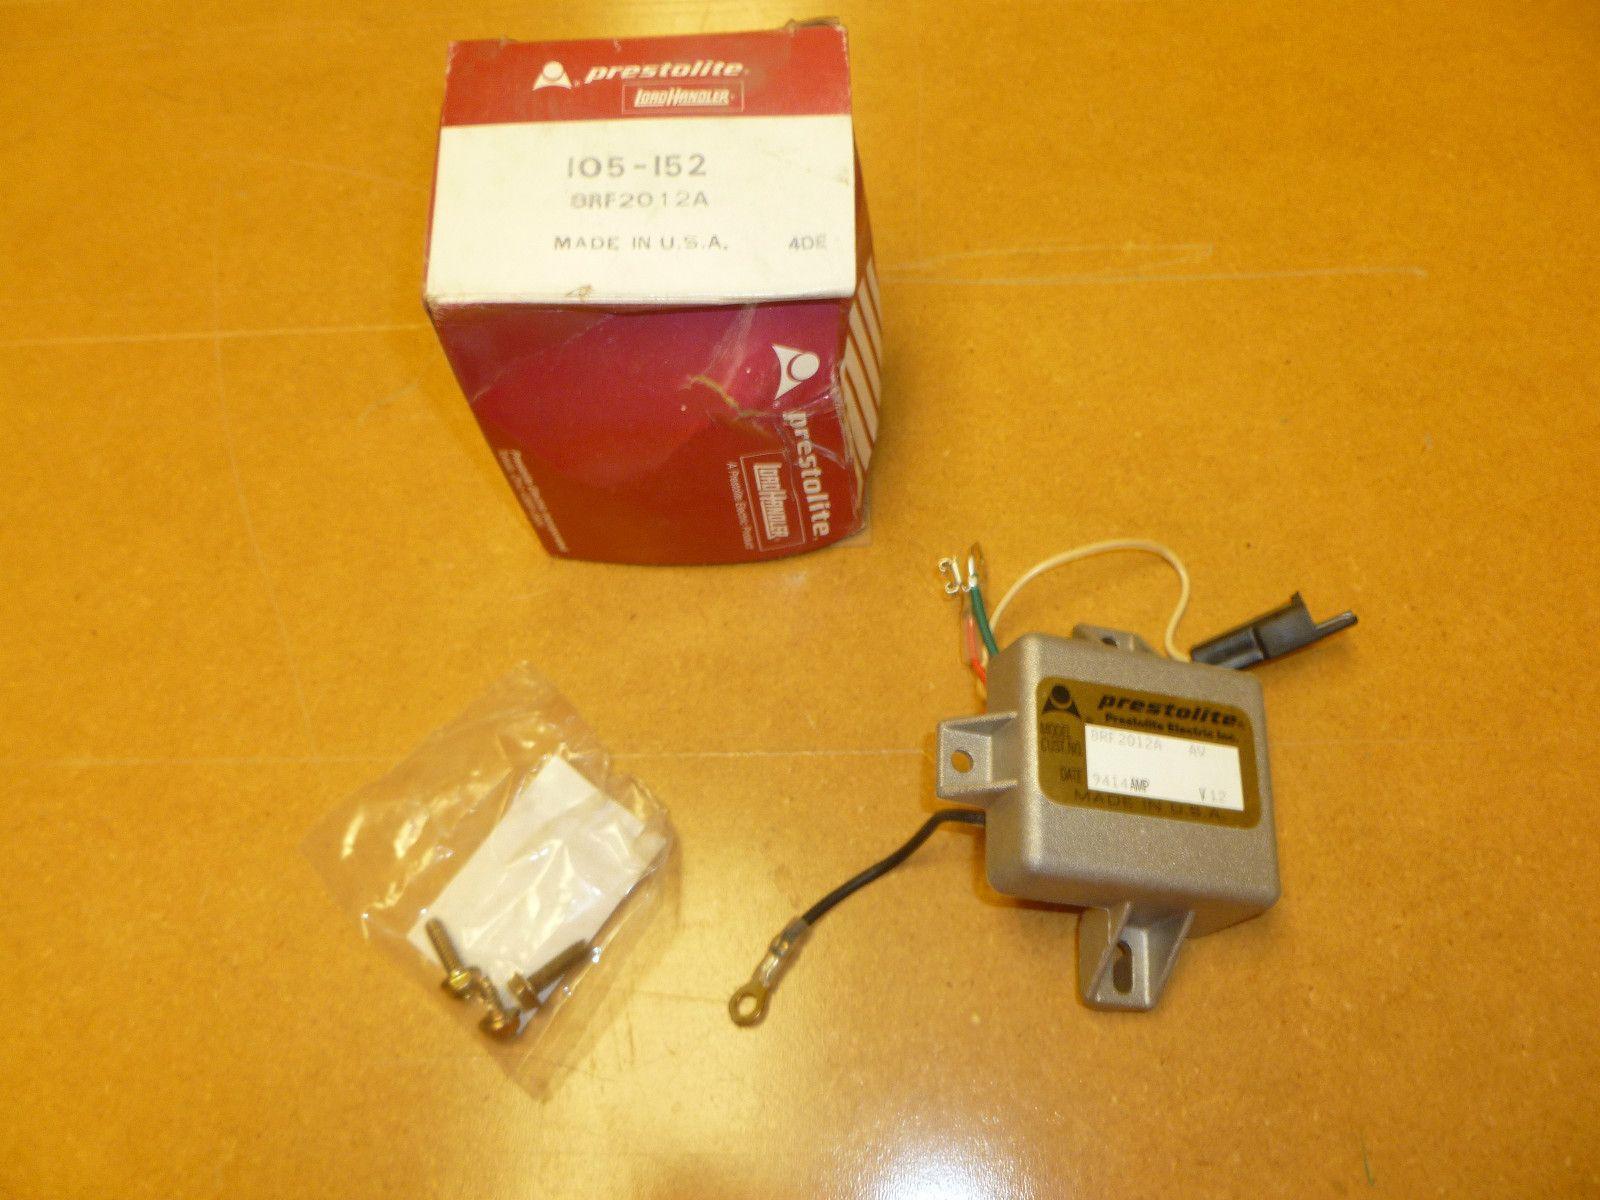 You are buying one 105-152 Prestolite 12 volts Voltage Regulators